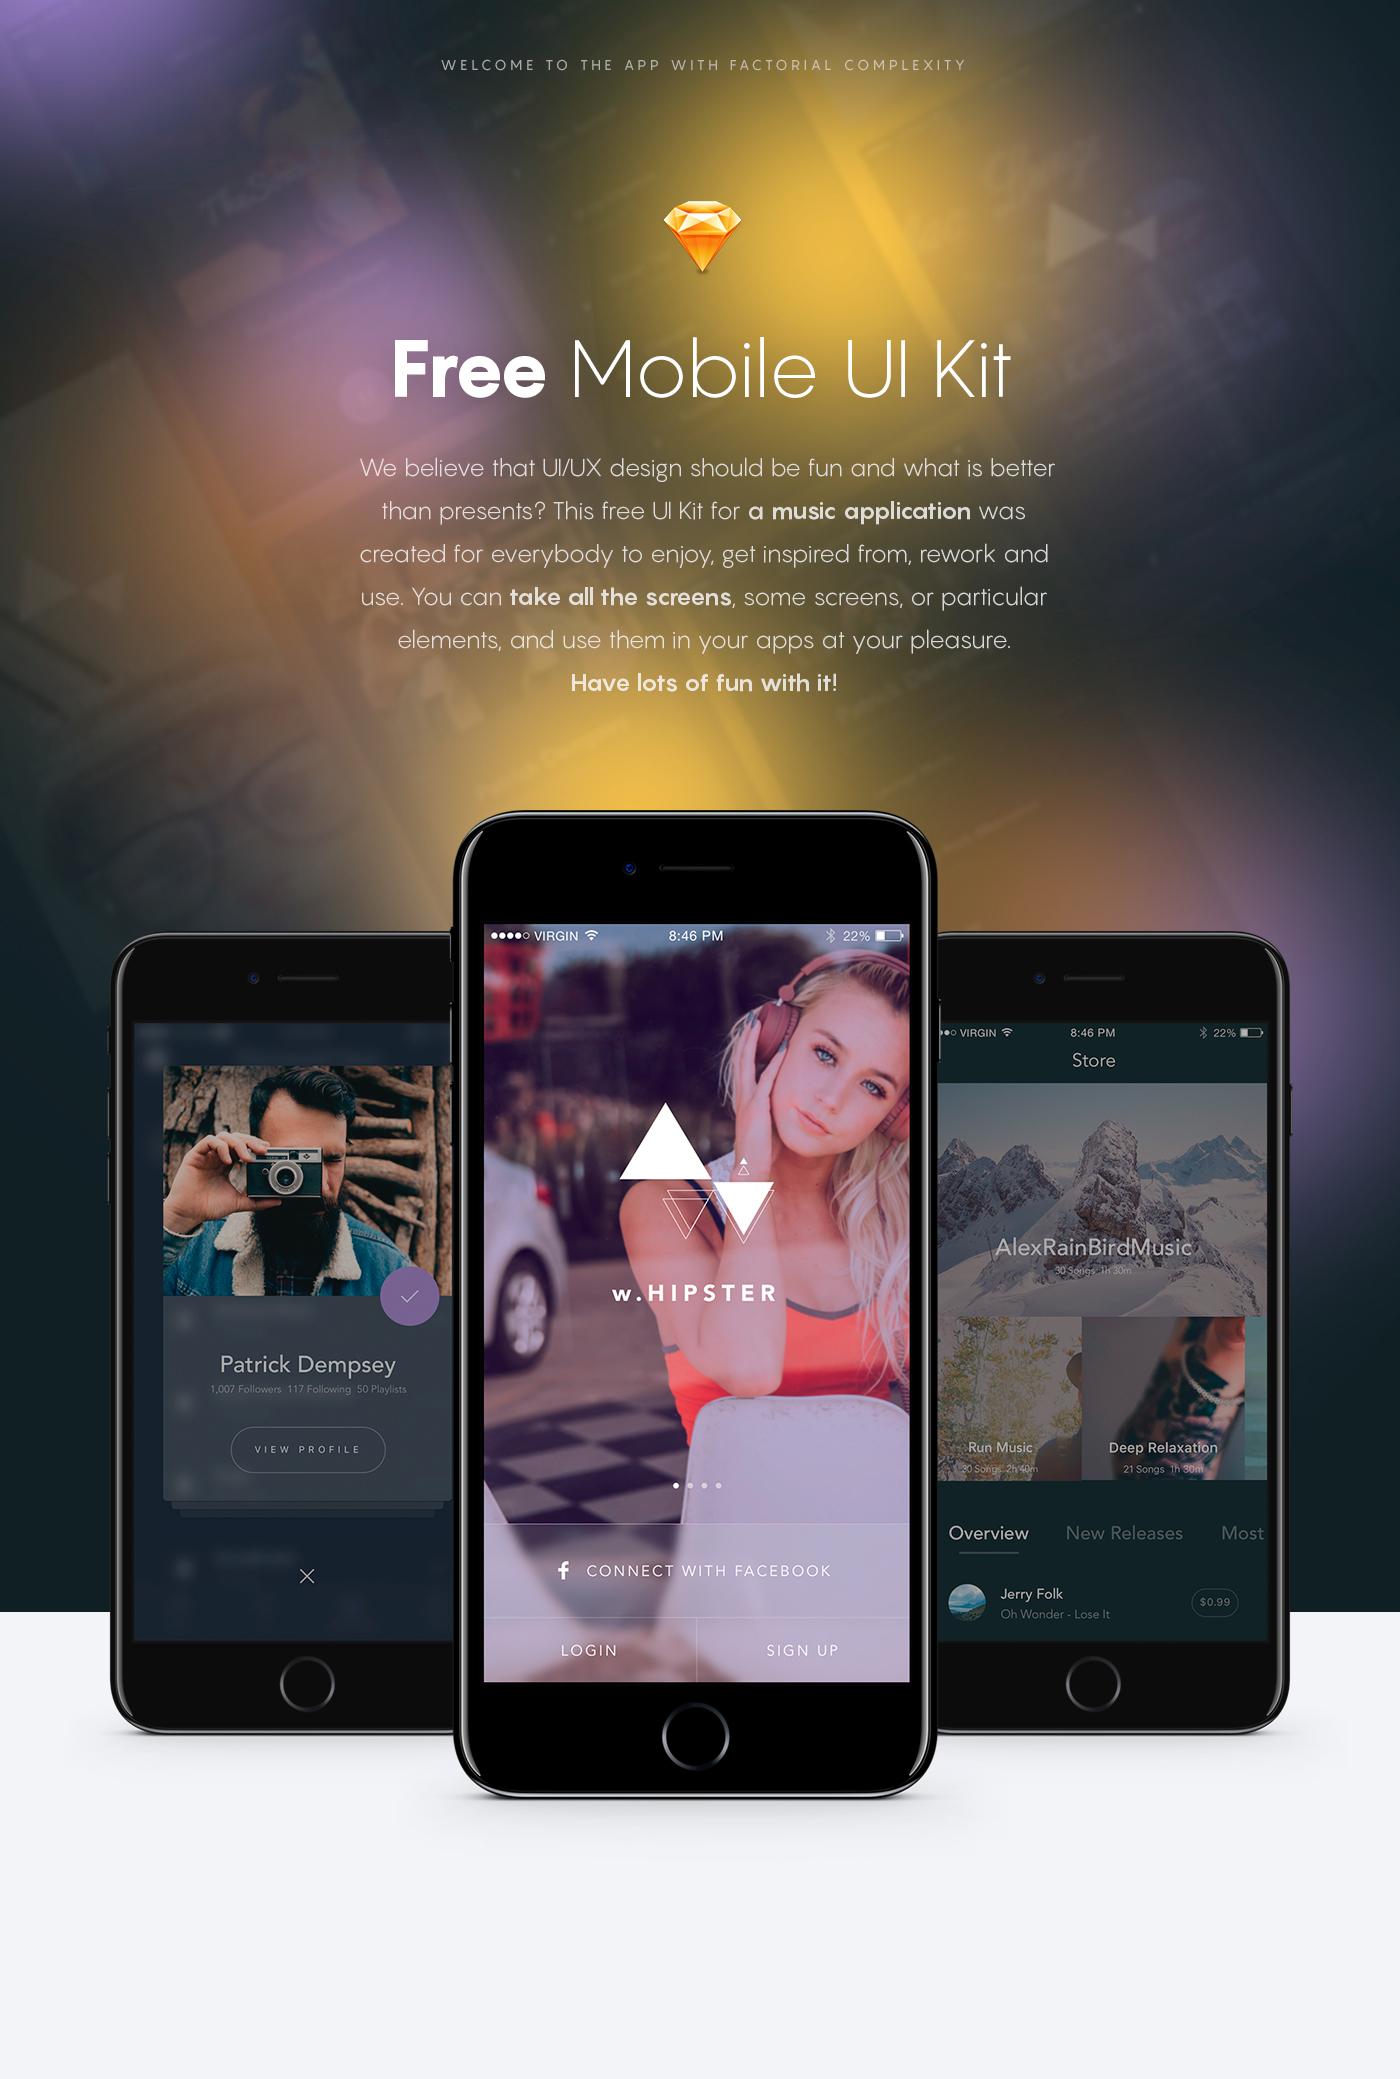 free Free App free screens music app iOS App music free download inspiration